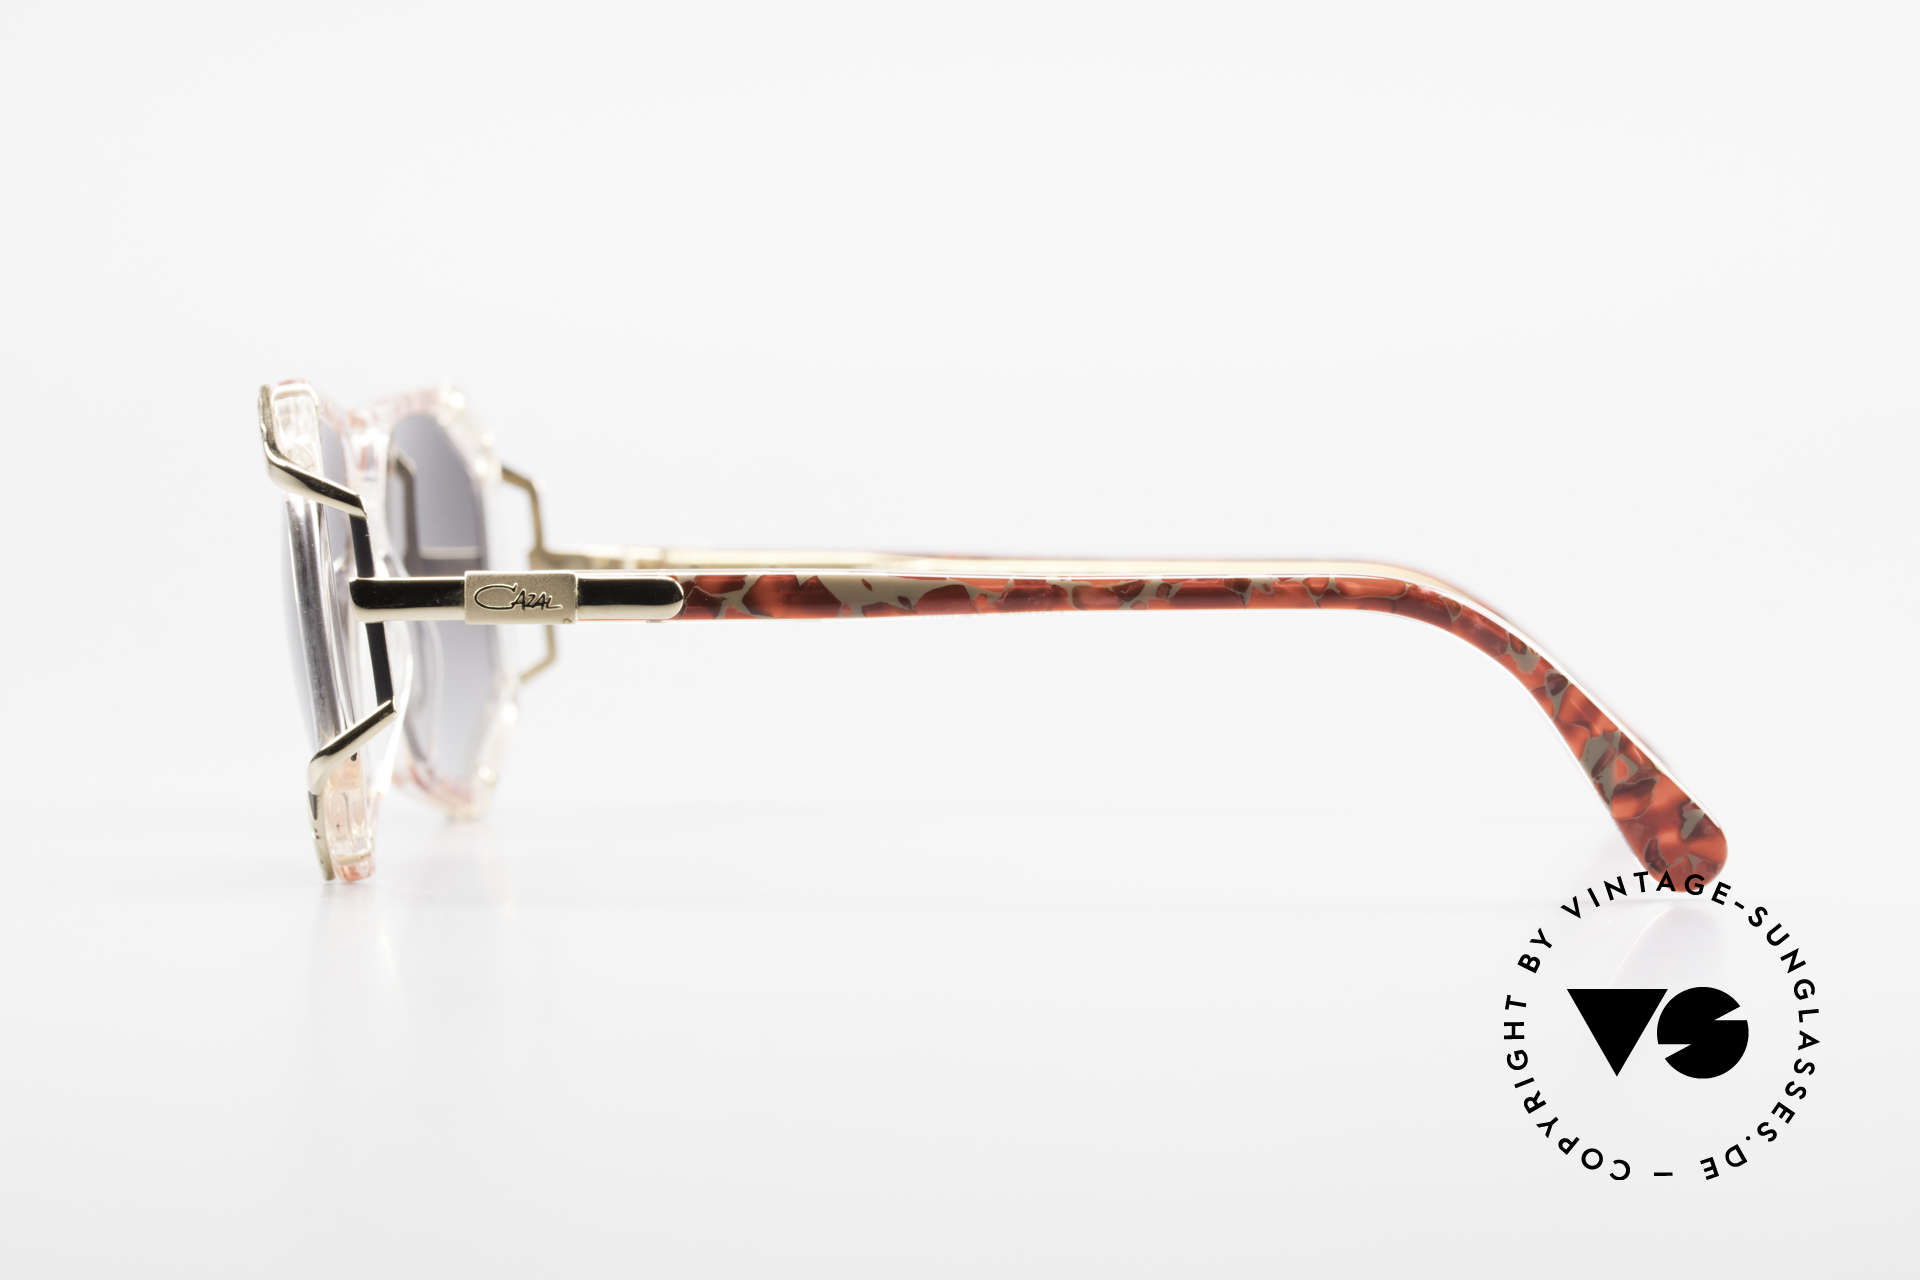 Cazal 355 Spectacular Cazal Sunglasses, unworn, NOS (like all our rare CAZAL vintage eyewear), Made for Women